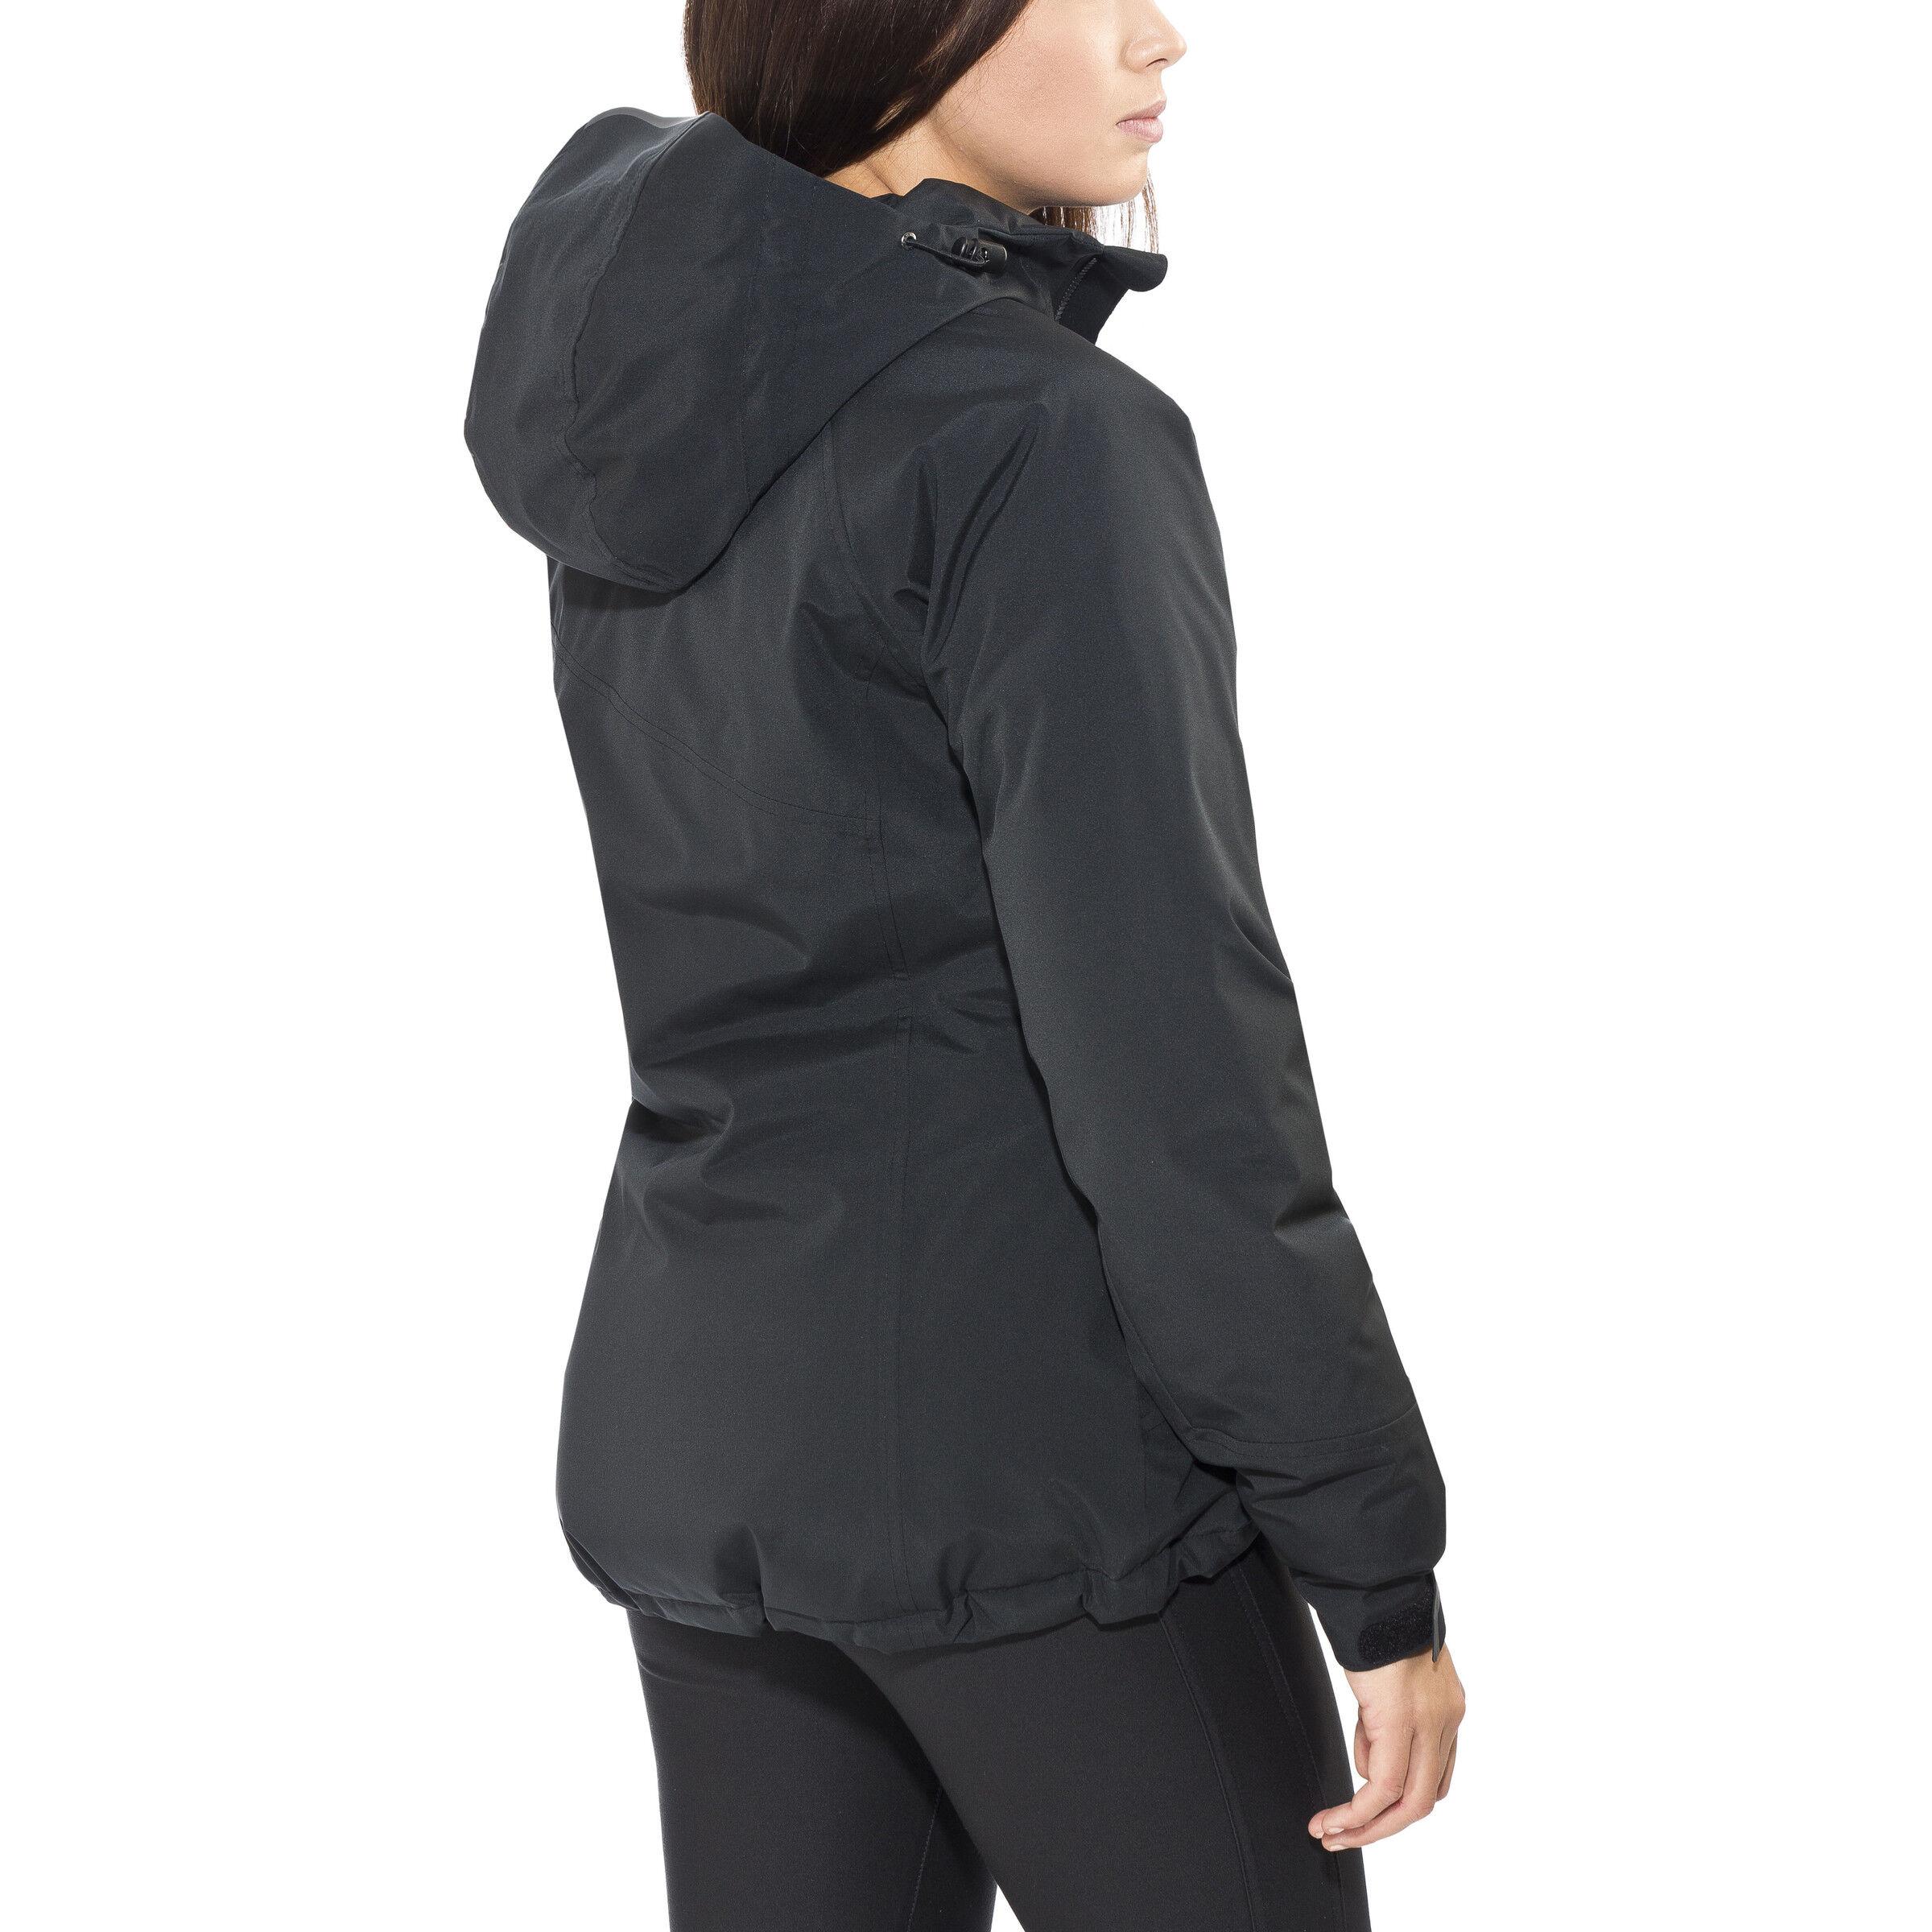 Hardshell Jacket Damen Down Black Rhonga Yeti jVGqMSpzLU